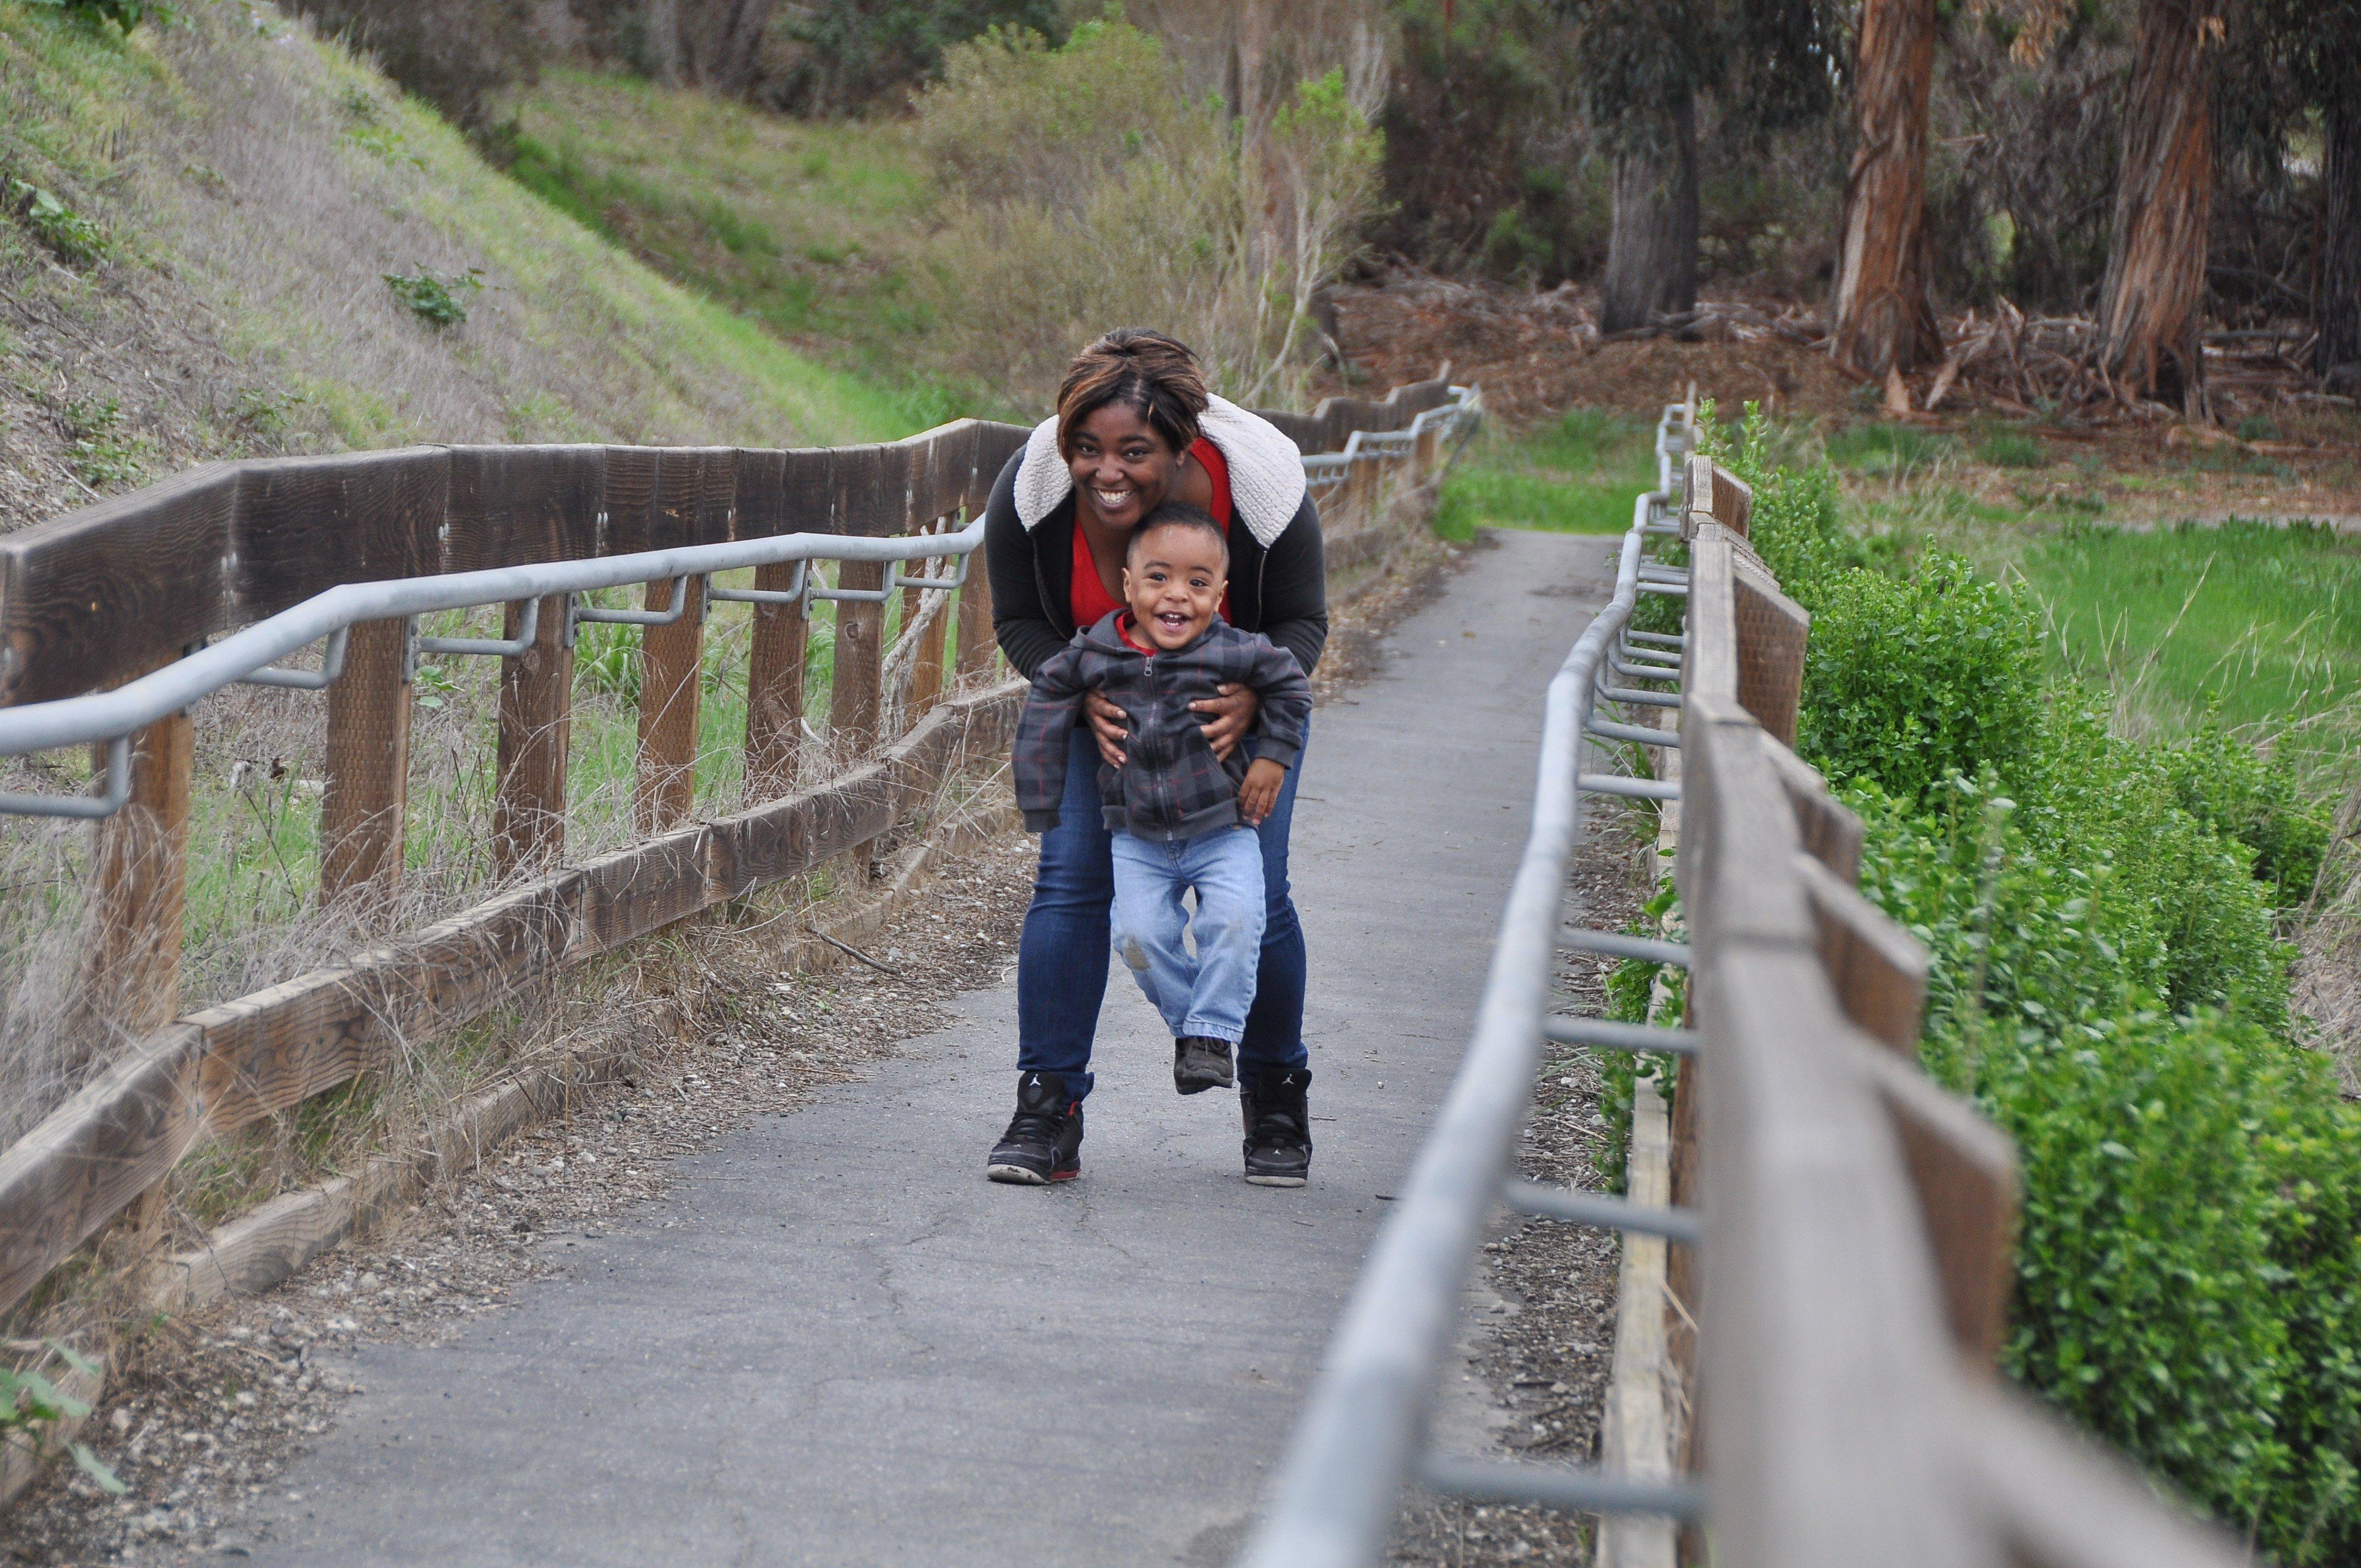 Mother_son_Ulistac_bridge_Liv_Ames - photoshopped